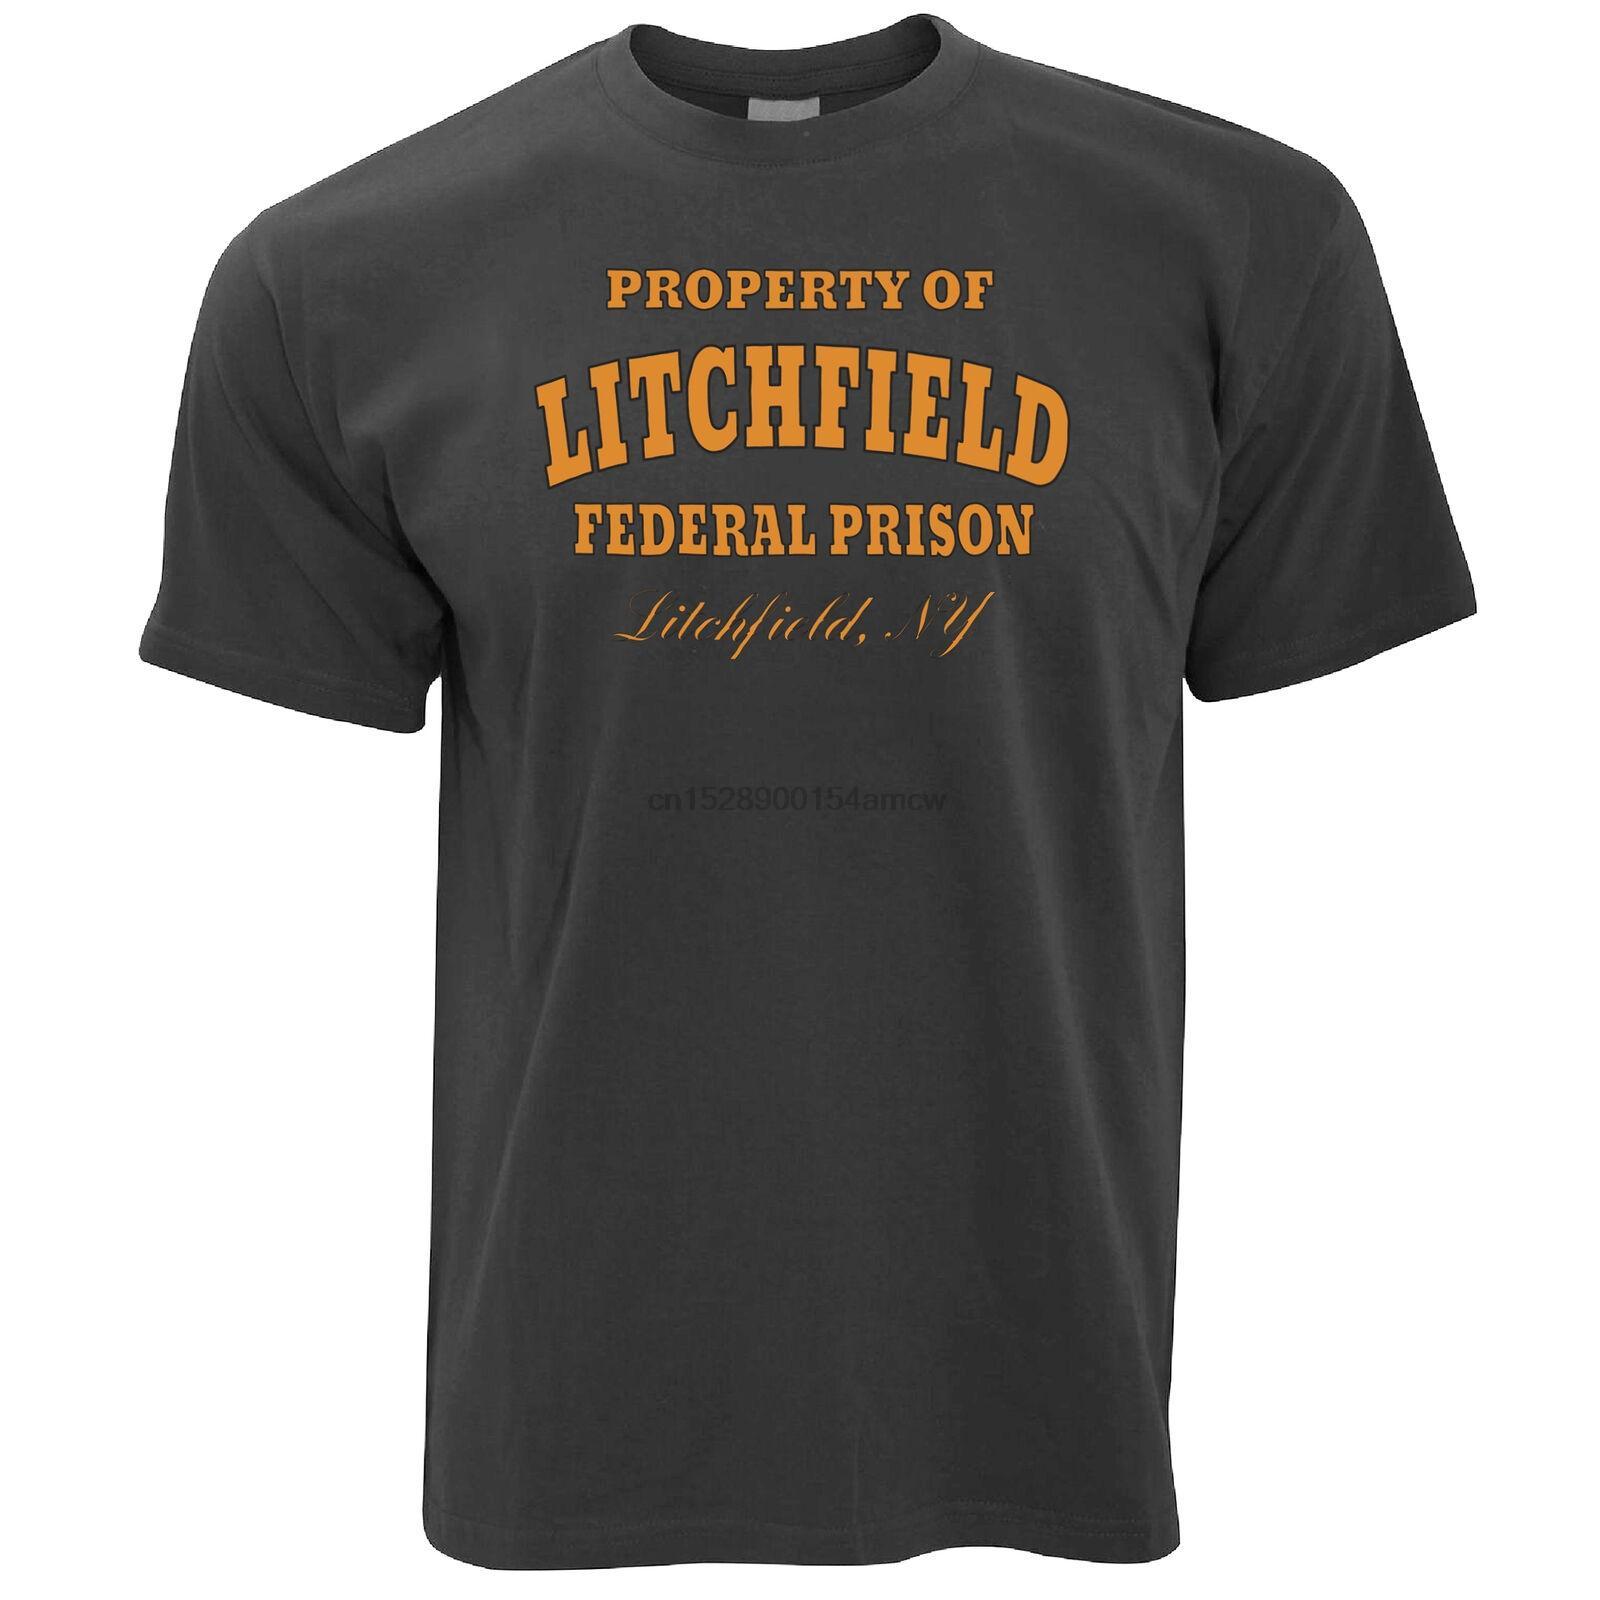 Litchfield Federal Cezaevi Cezaevi Portakal Mahkûm Parodi T Gömlek Of Mülkiyet